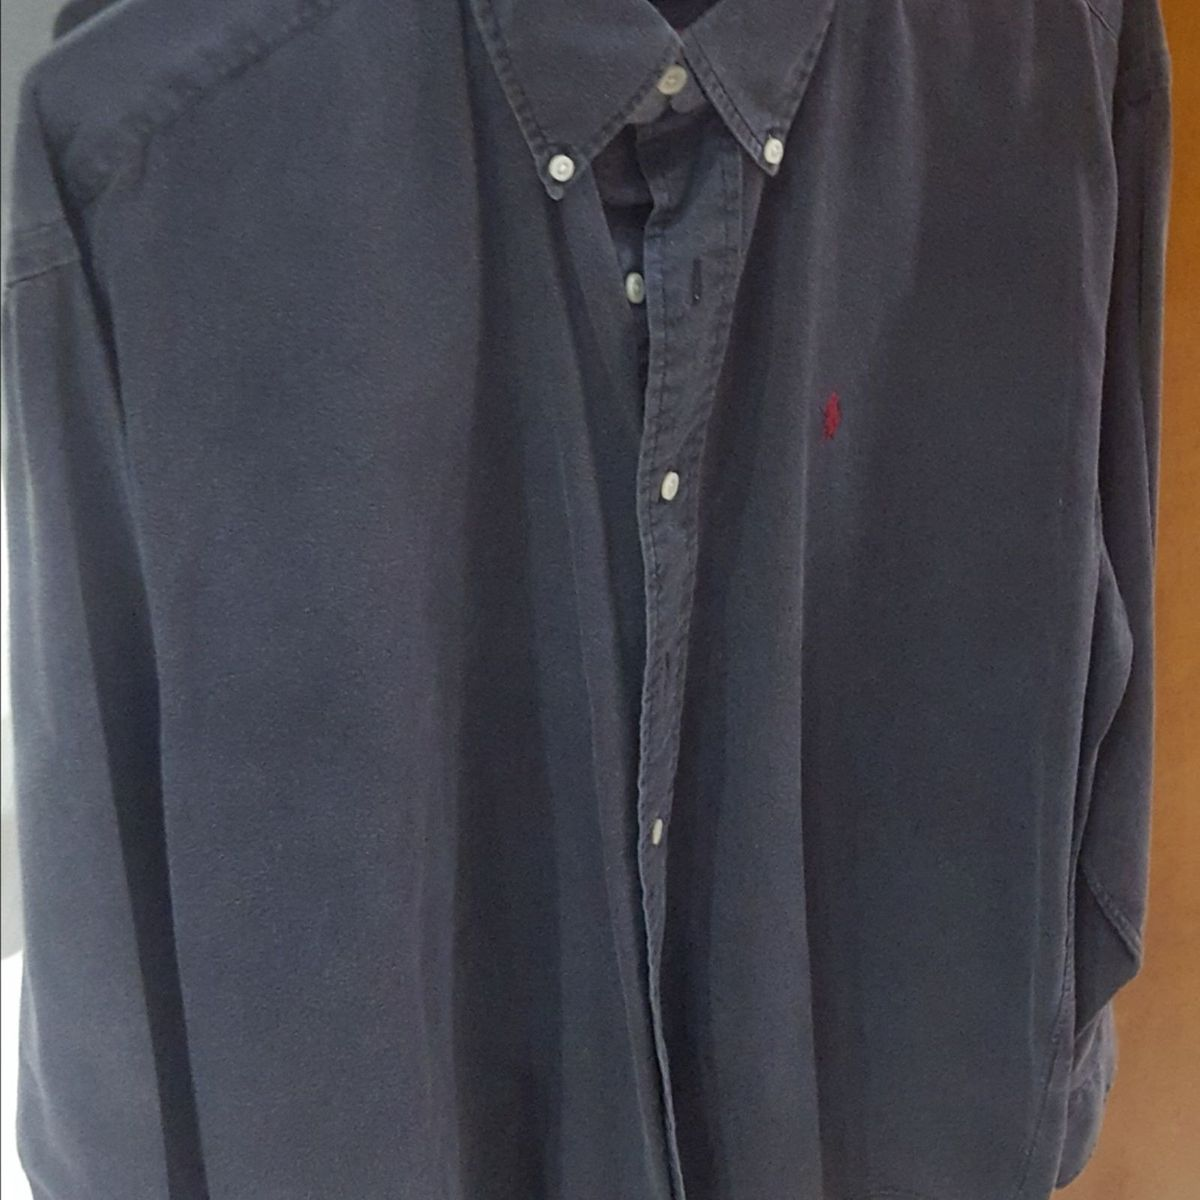 Camisa Polo Ralph Lauren Original - M - Importada  59da5e4bee0